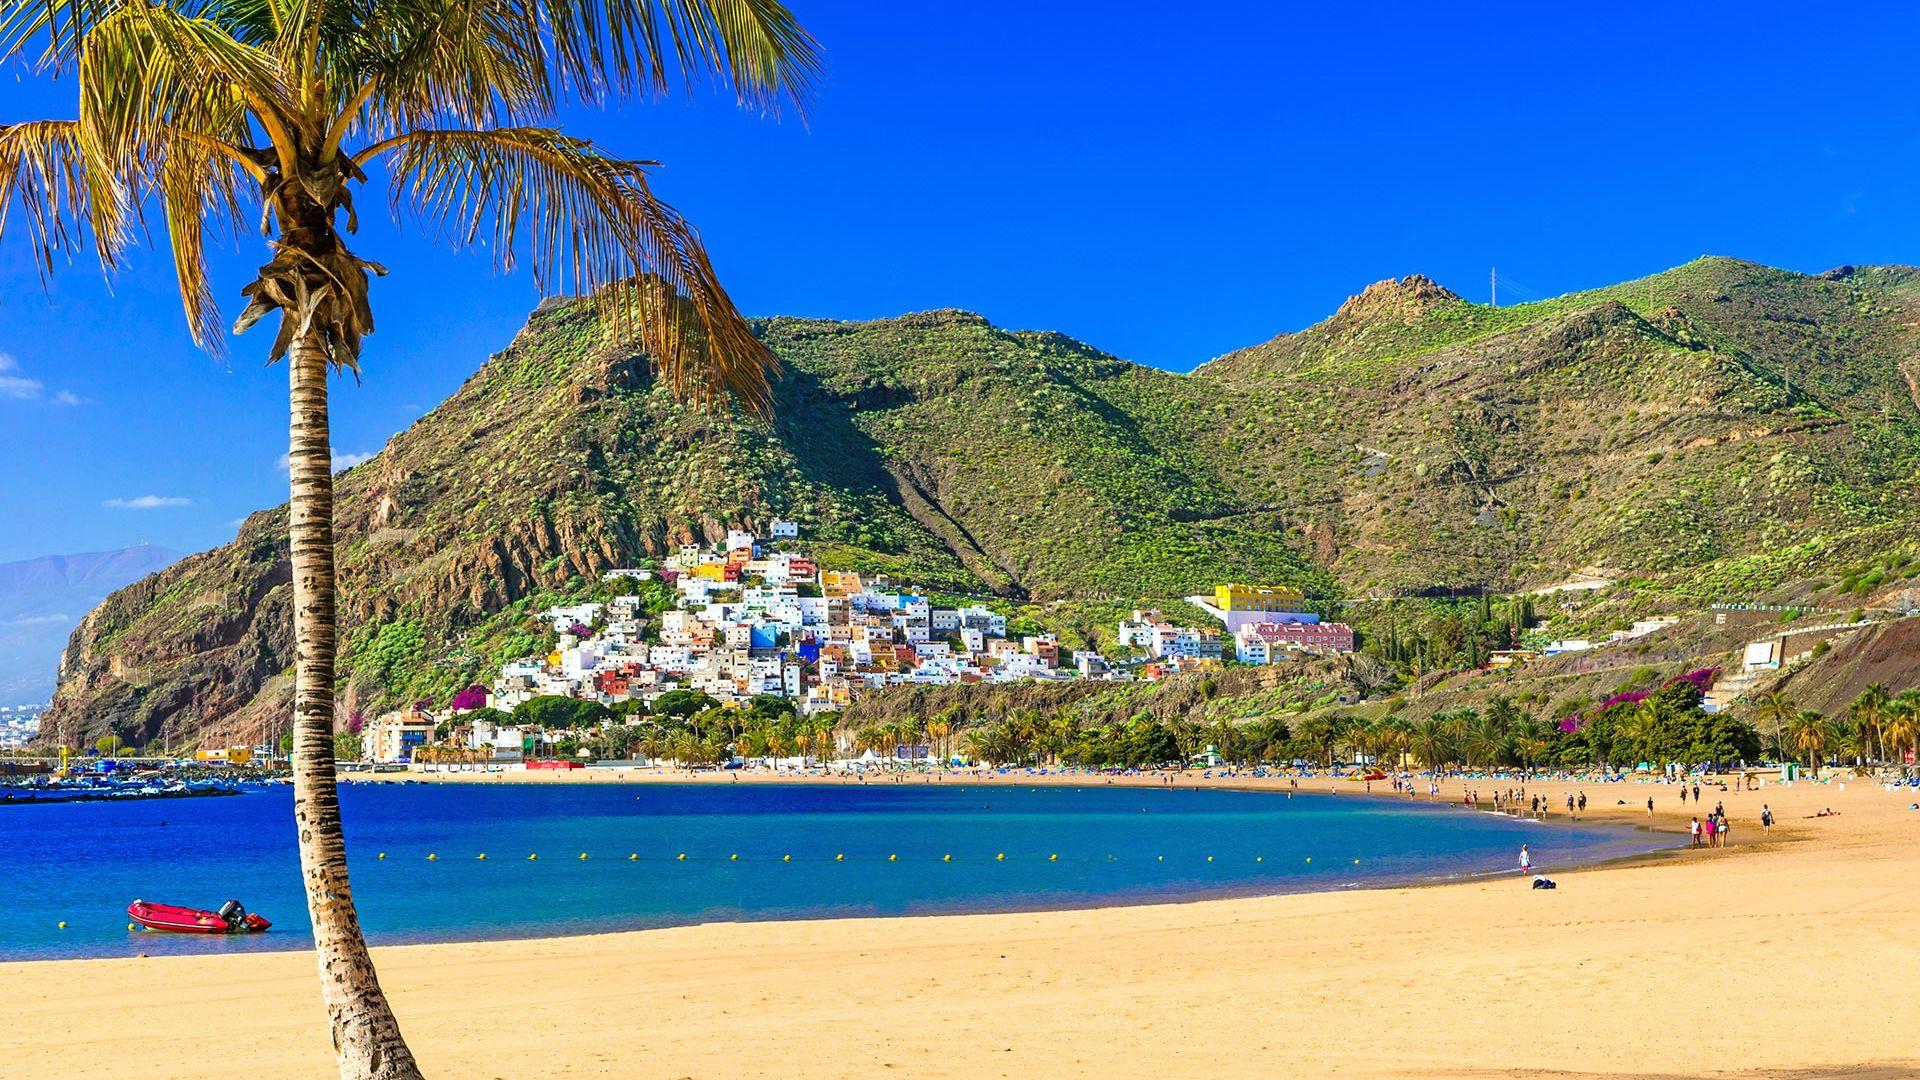 Sejur plaja Tenerife, 9 zile - august 2021